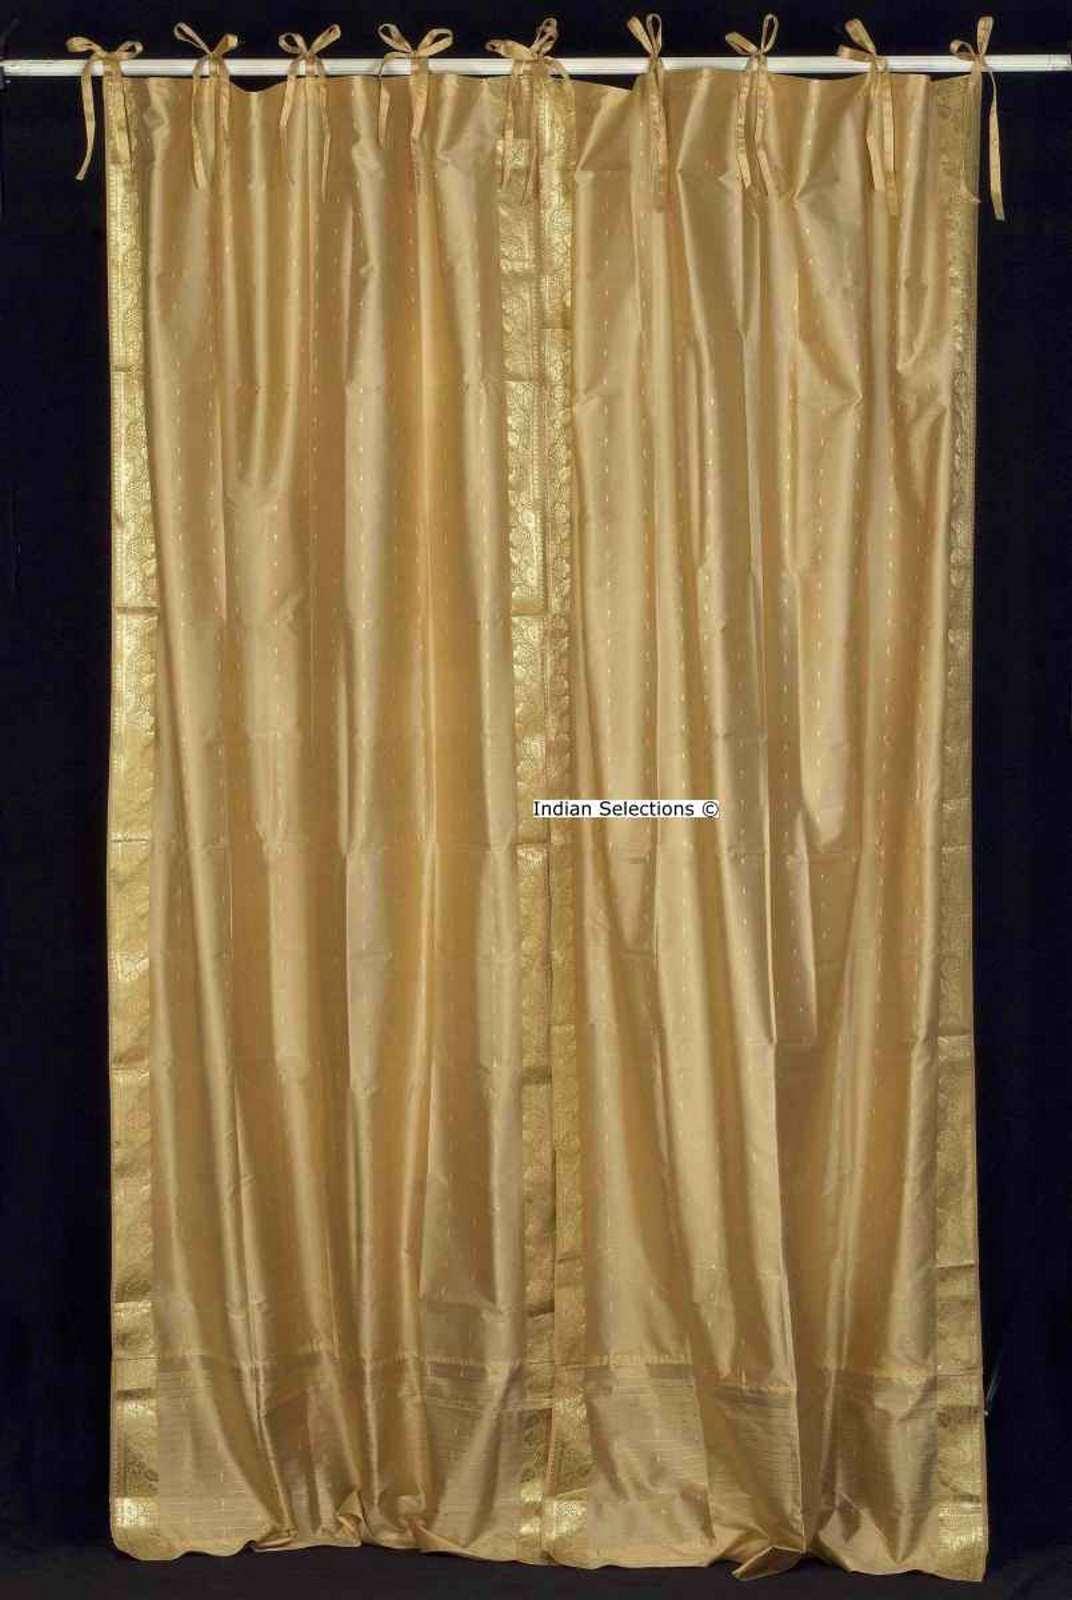 Lined-Golden  Tie Top  Sheer Sari Curtain  Drape  Panel   - 80W x 63L - Pair